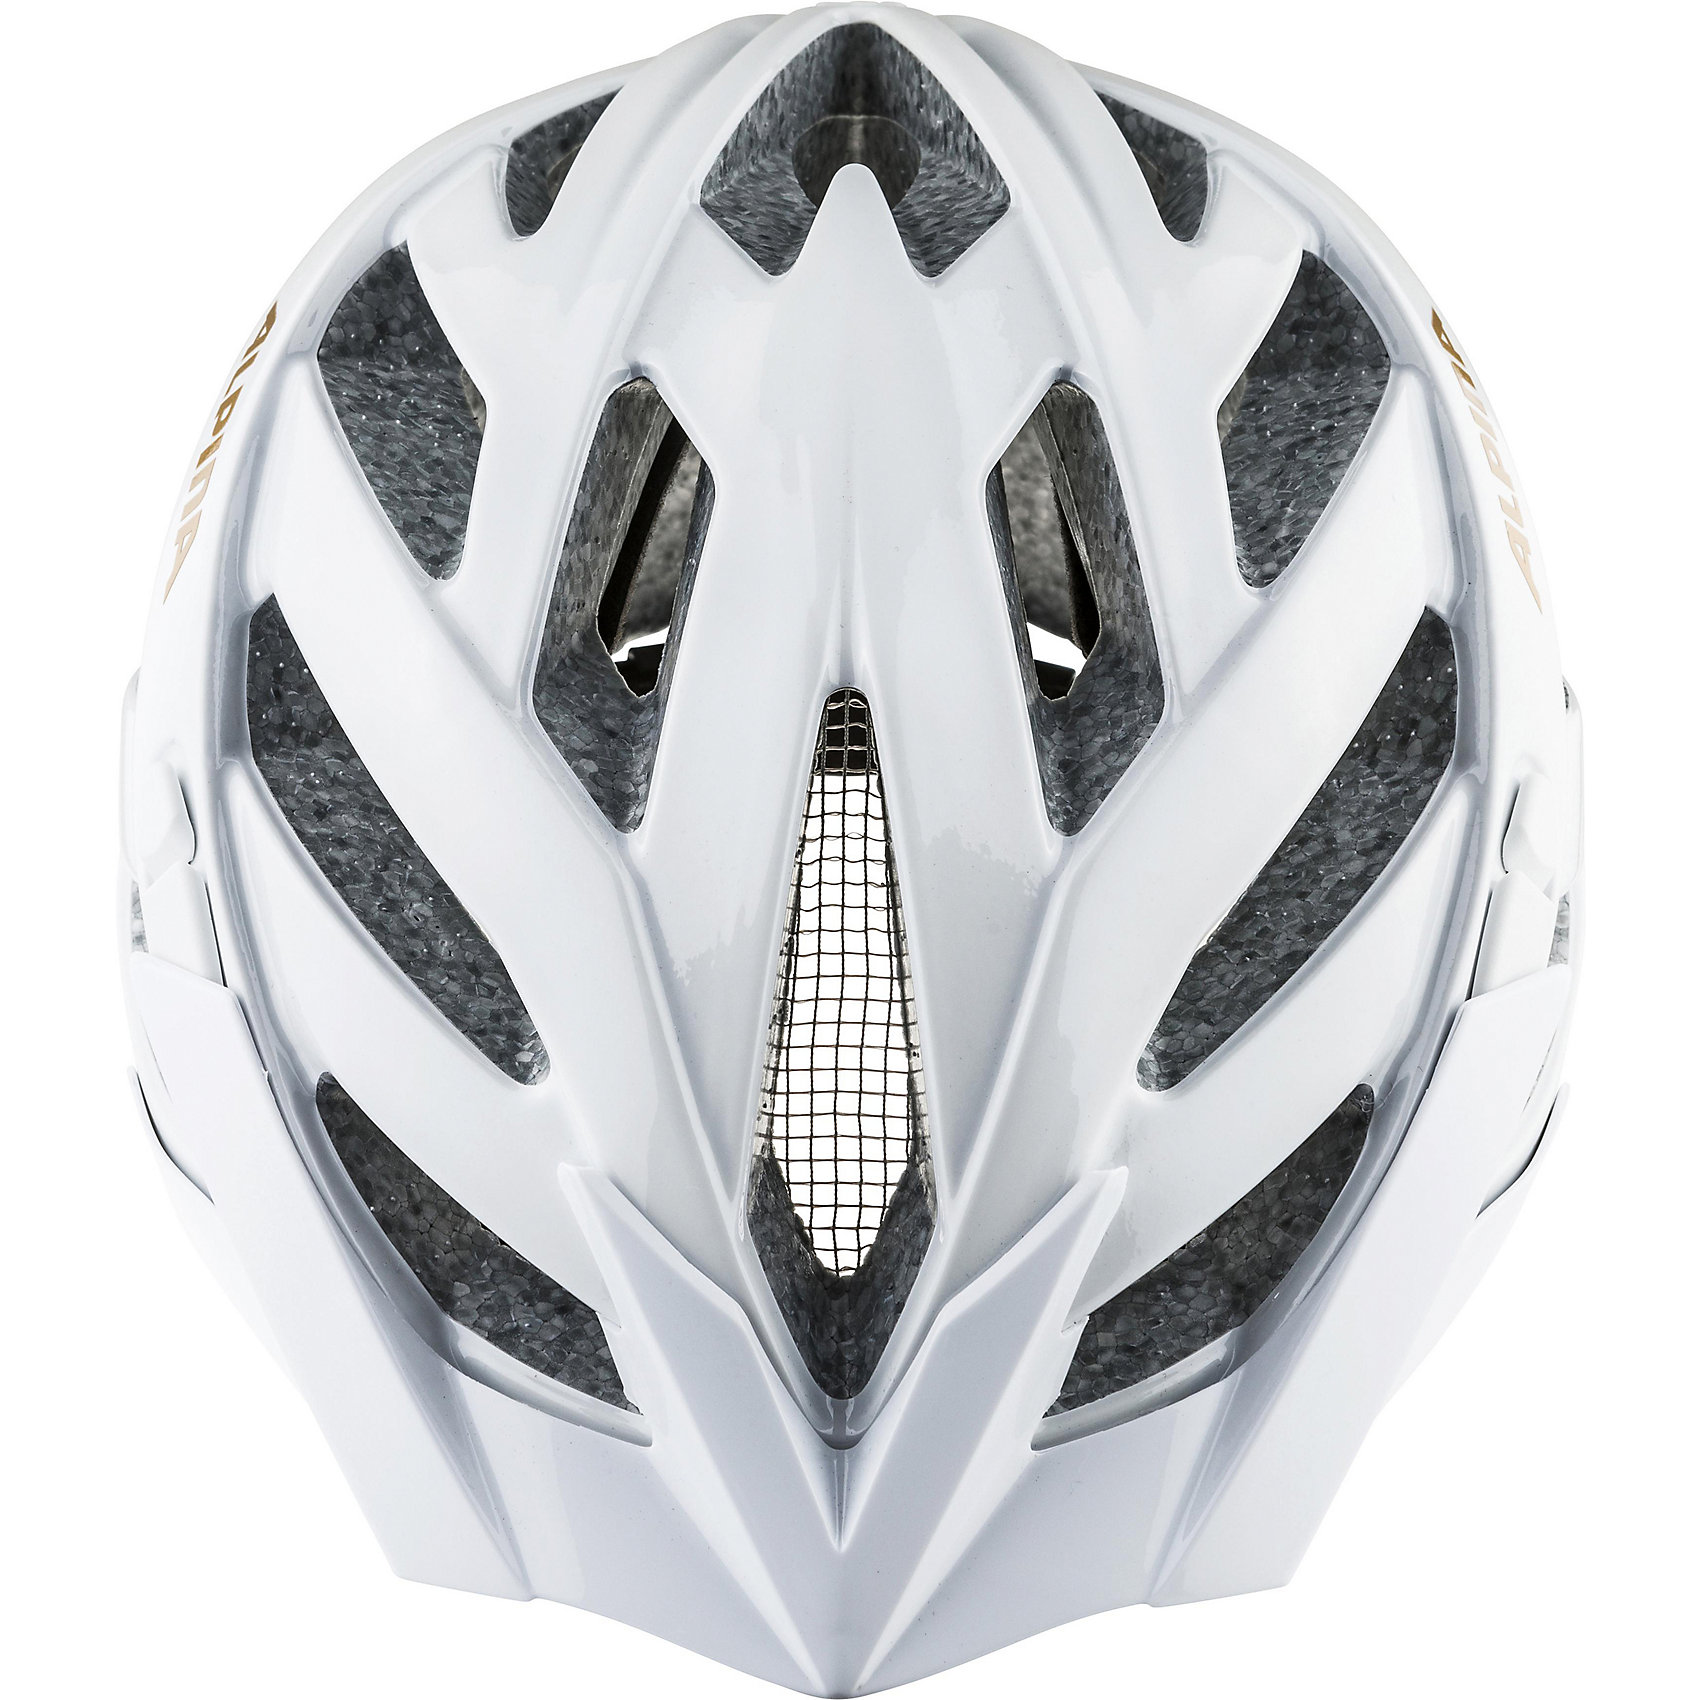 Neu ALPINA Fahrradhelm Panoma Classic Classic Classic  Weiß-pRosacco 10607331 weiß b7360a